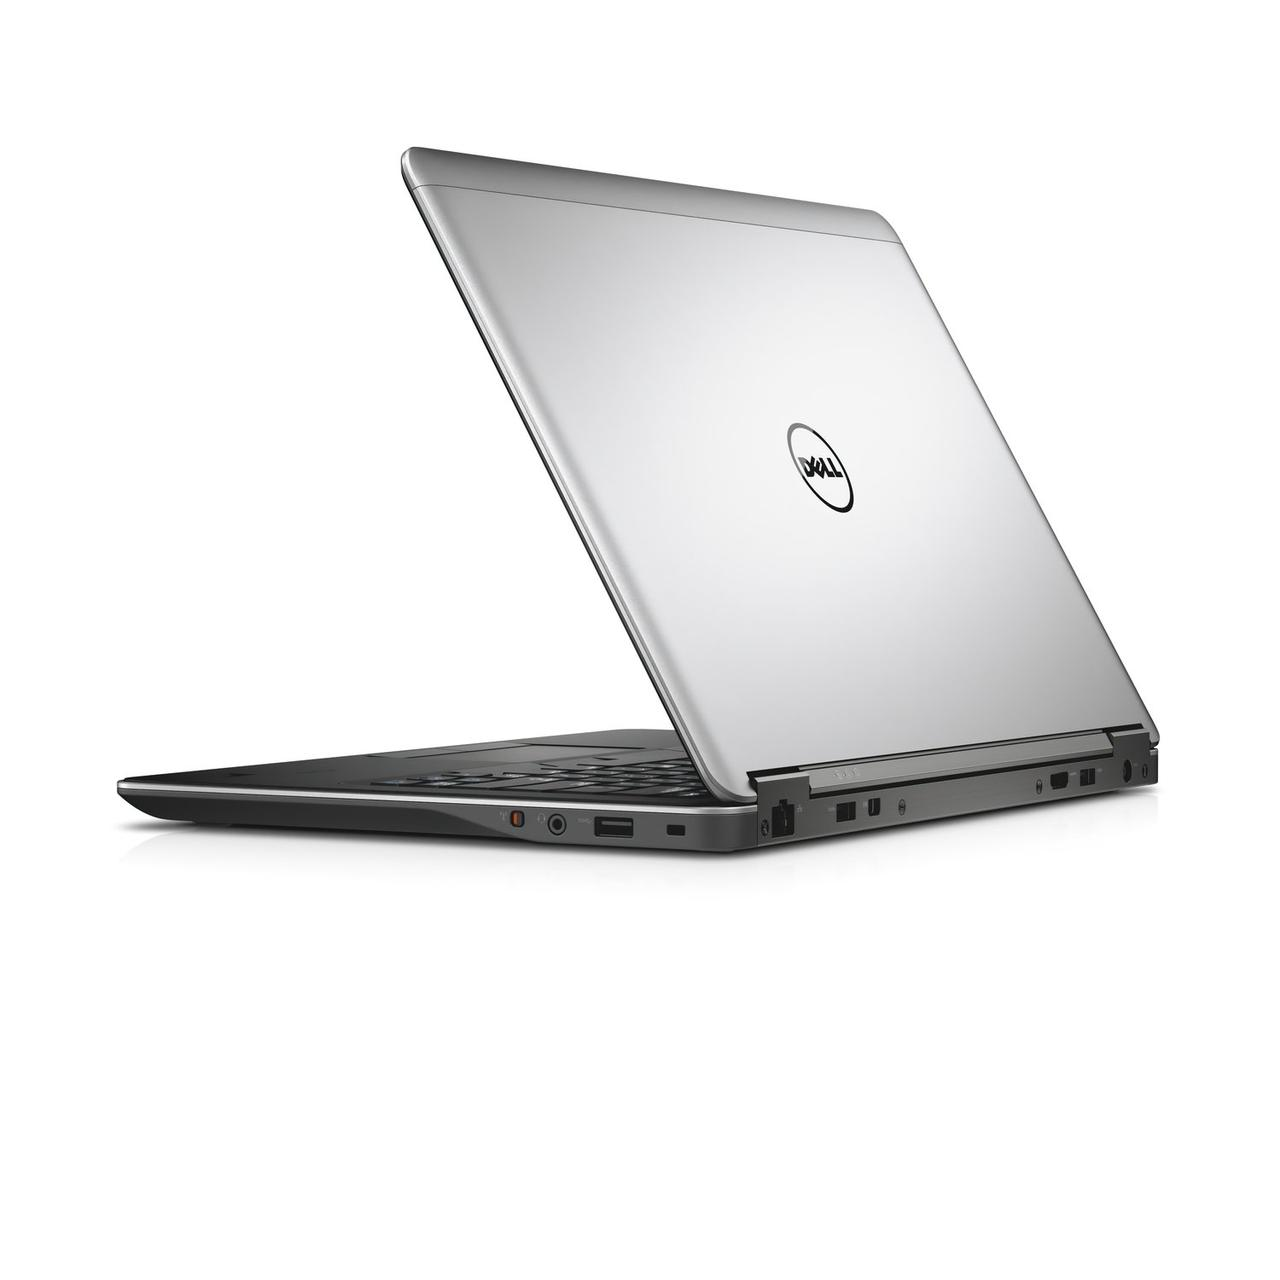 Б/У Dell Latitude E7440 14″ FullHD IPS i5-4300U/DDR3 8 Gb /SSD 2